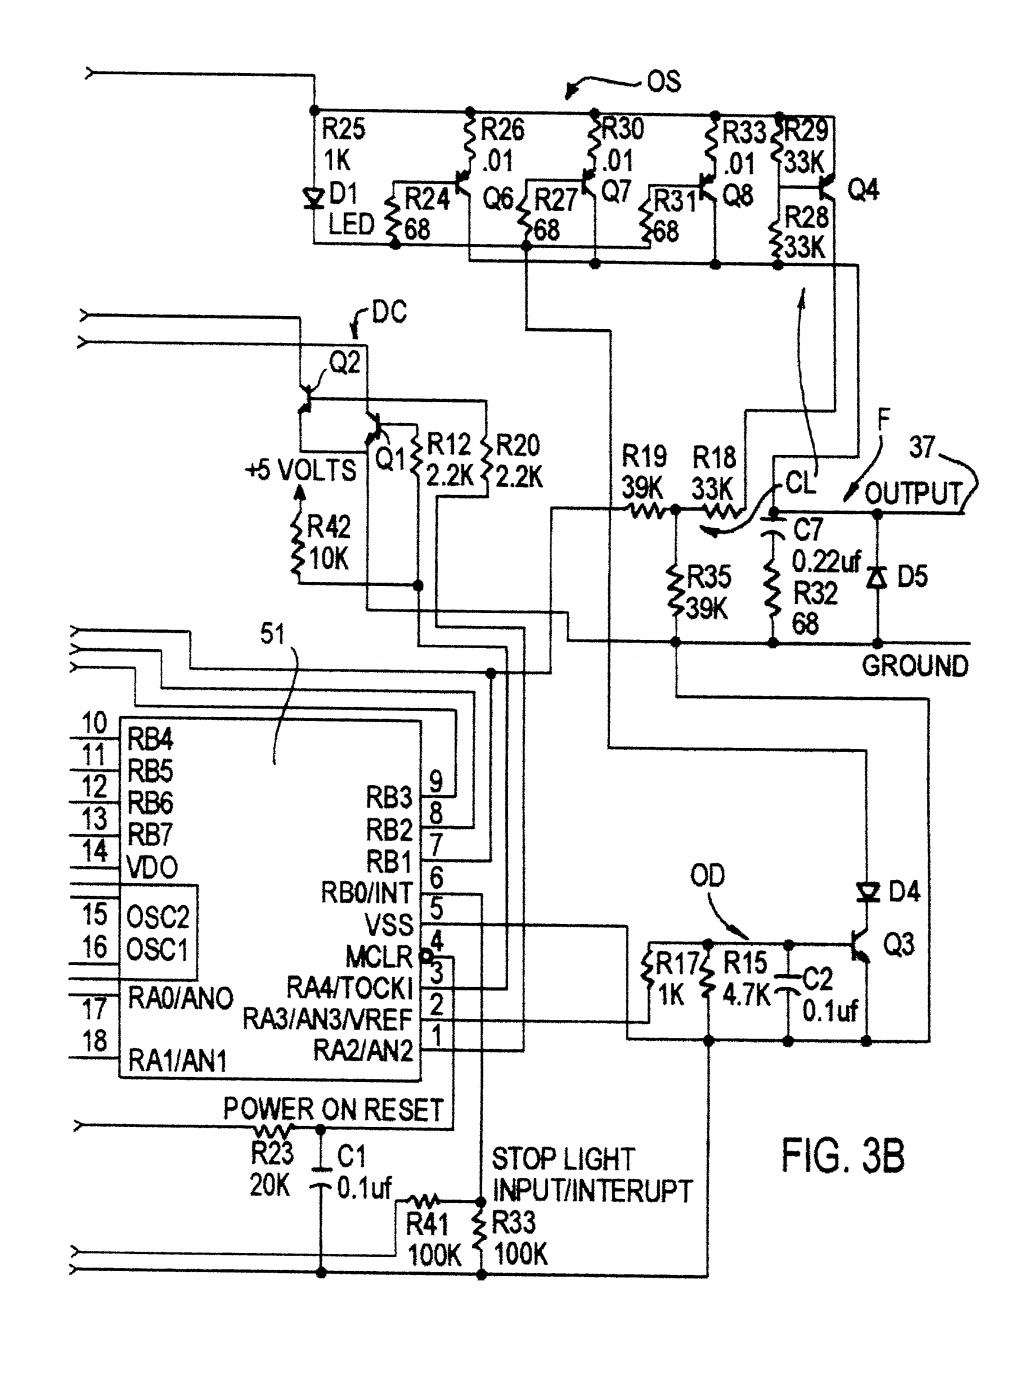 baja wilderness trail 90 wiring diagram wiring library Baja 90Cc Viper Wiring-Diagram baja wilderness trail 90 wiring diagram